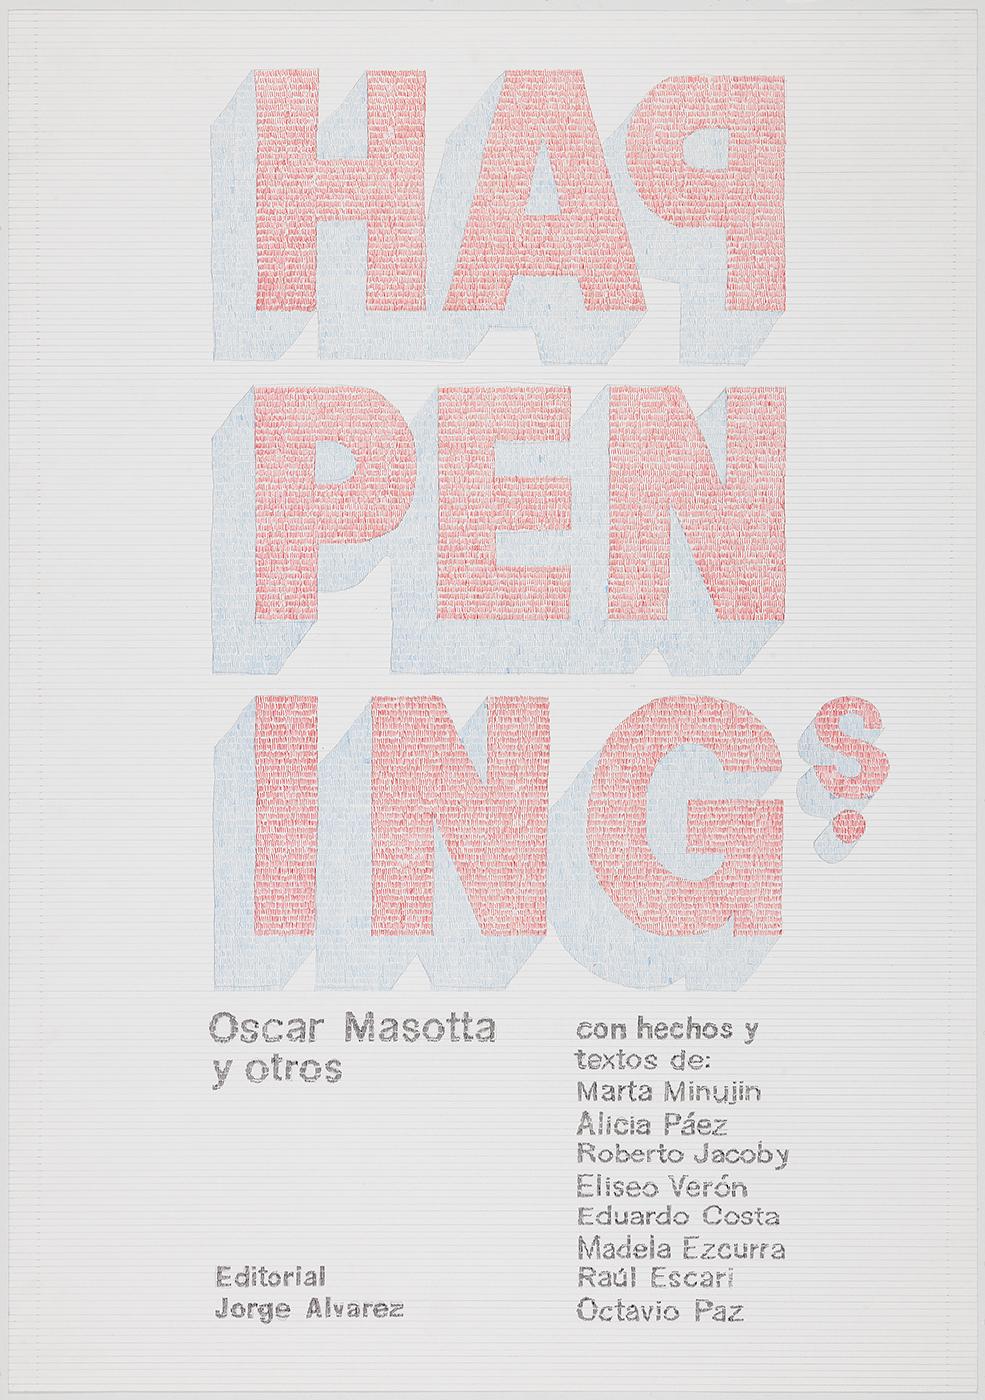 Gonzalo-Elvira-Happening-2017-Tinta-sobre-papel-100-x-70-cm